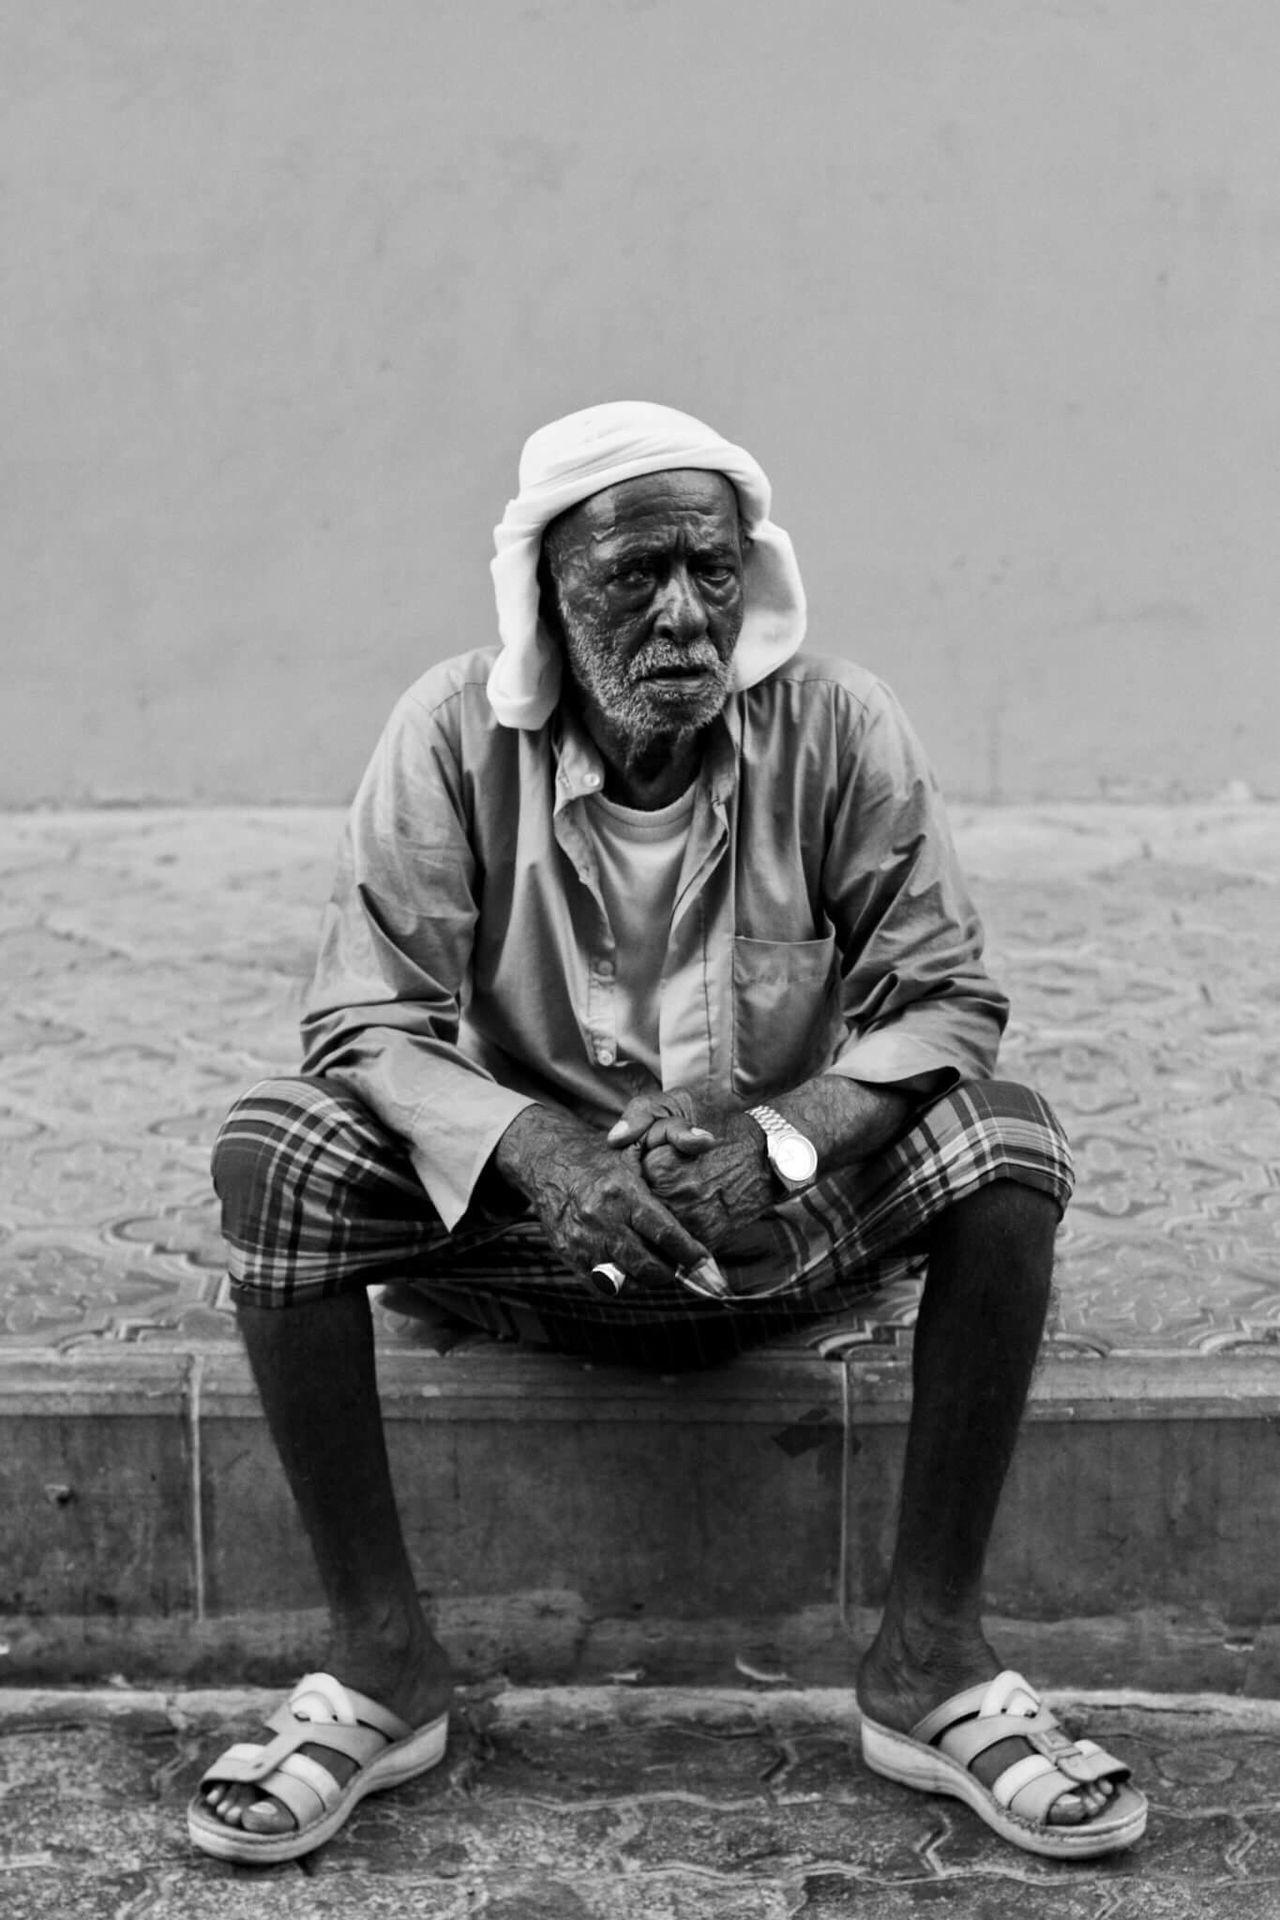 Old Man Sitting full length senior adult one person beard senior men Shoe real people one senior man only men one man only outdoors portrait day only men Adult Adults Only people first eyeem photo Dubai streetphotography EyeEm Best Shots EyeEmNewHere EyeEmAwards17 eyeemphotography